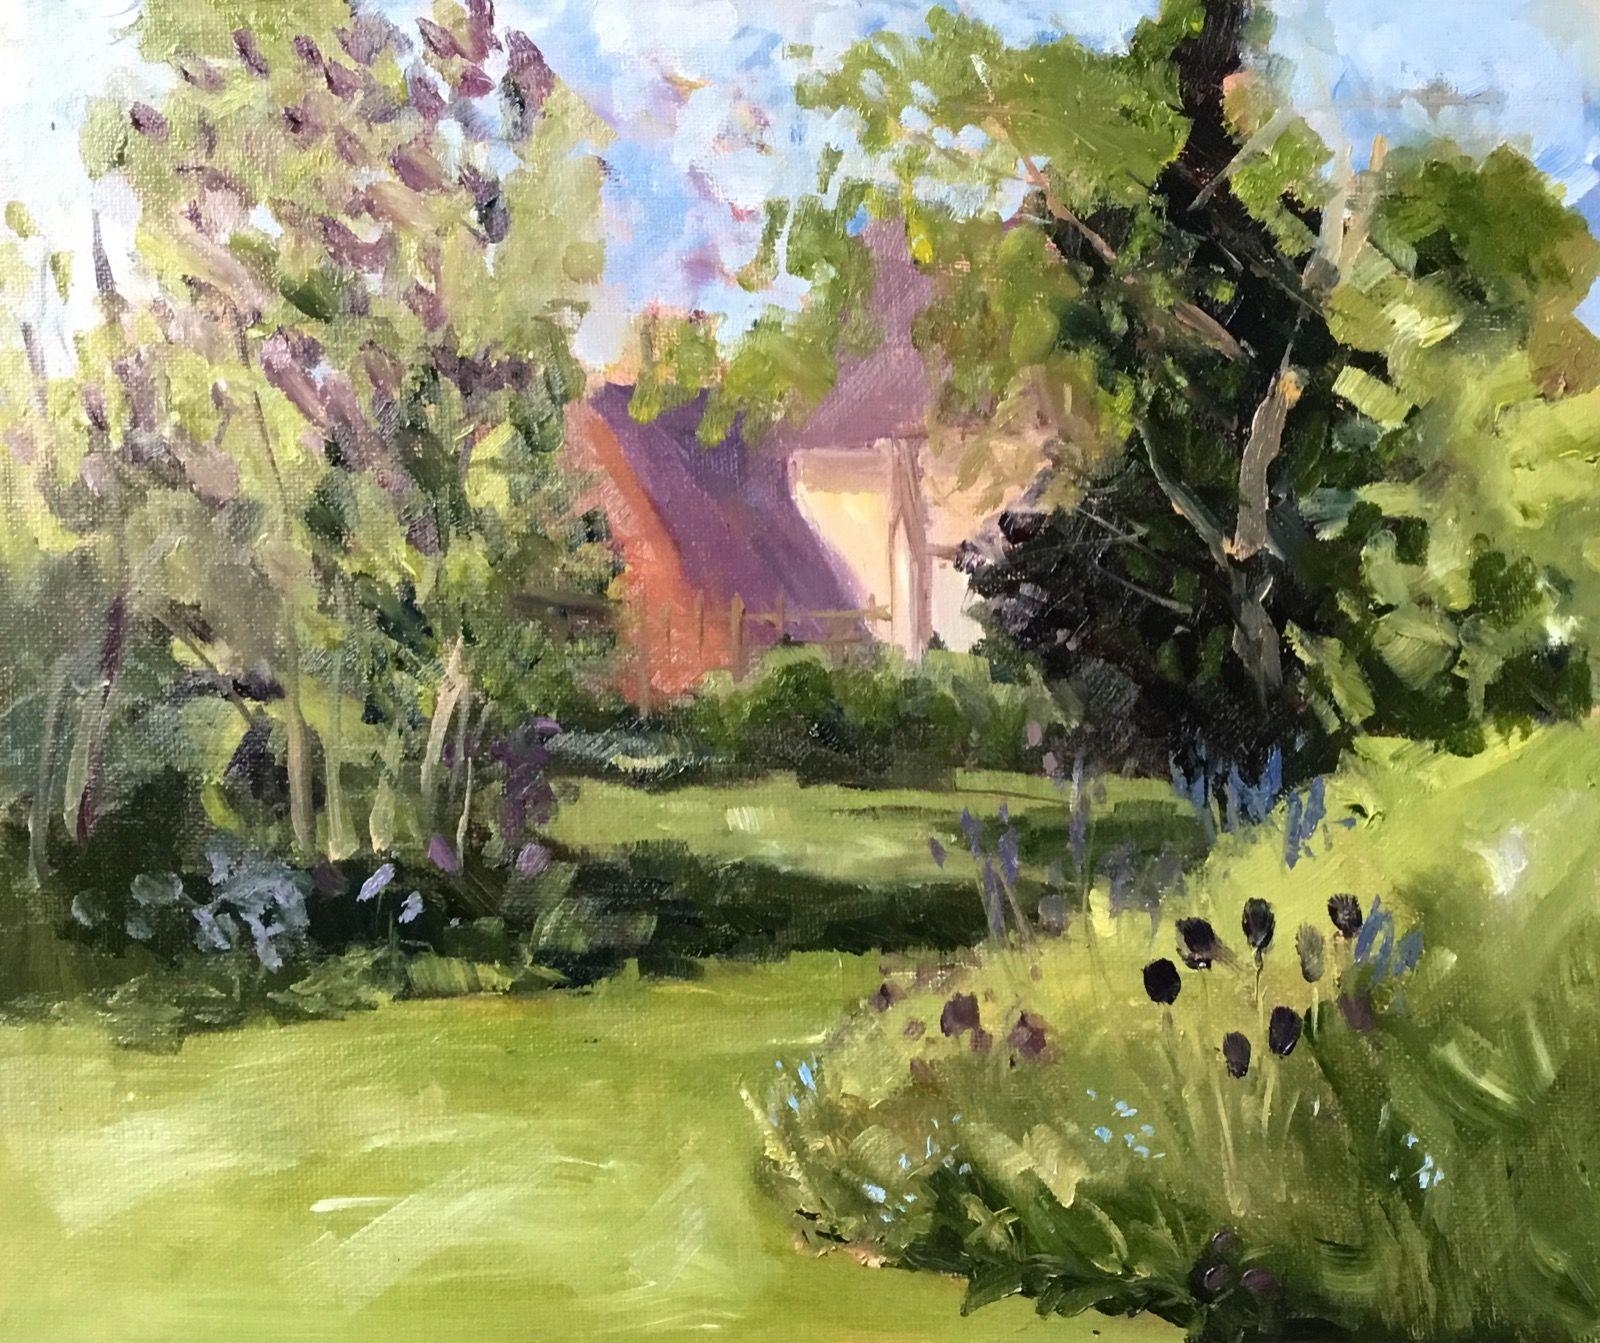 Kathy's Garden At Sibford.